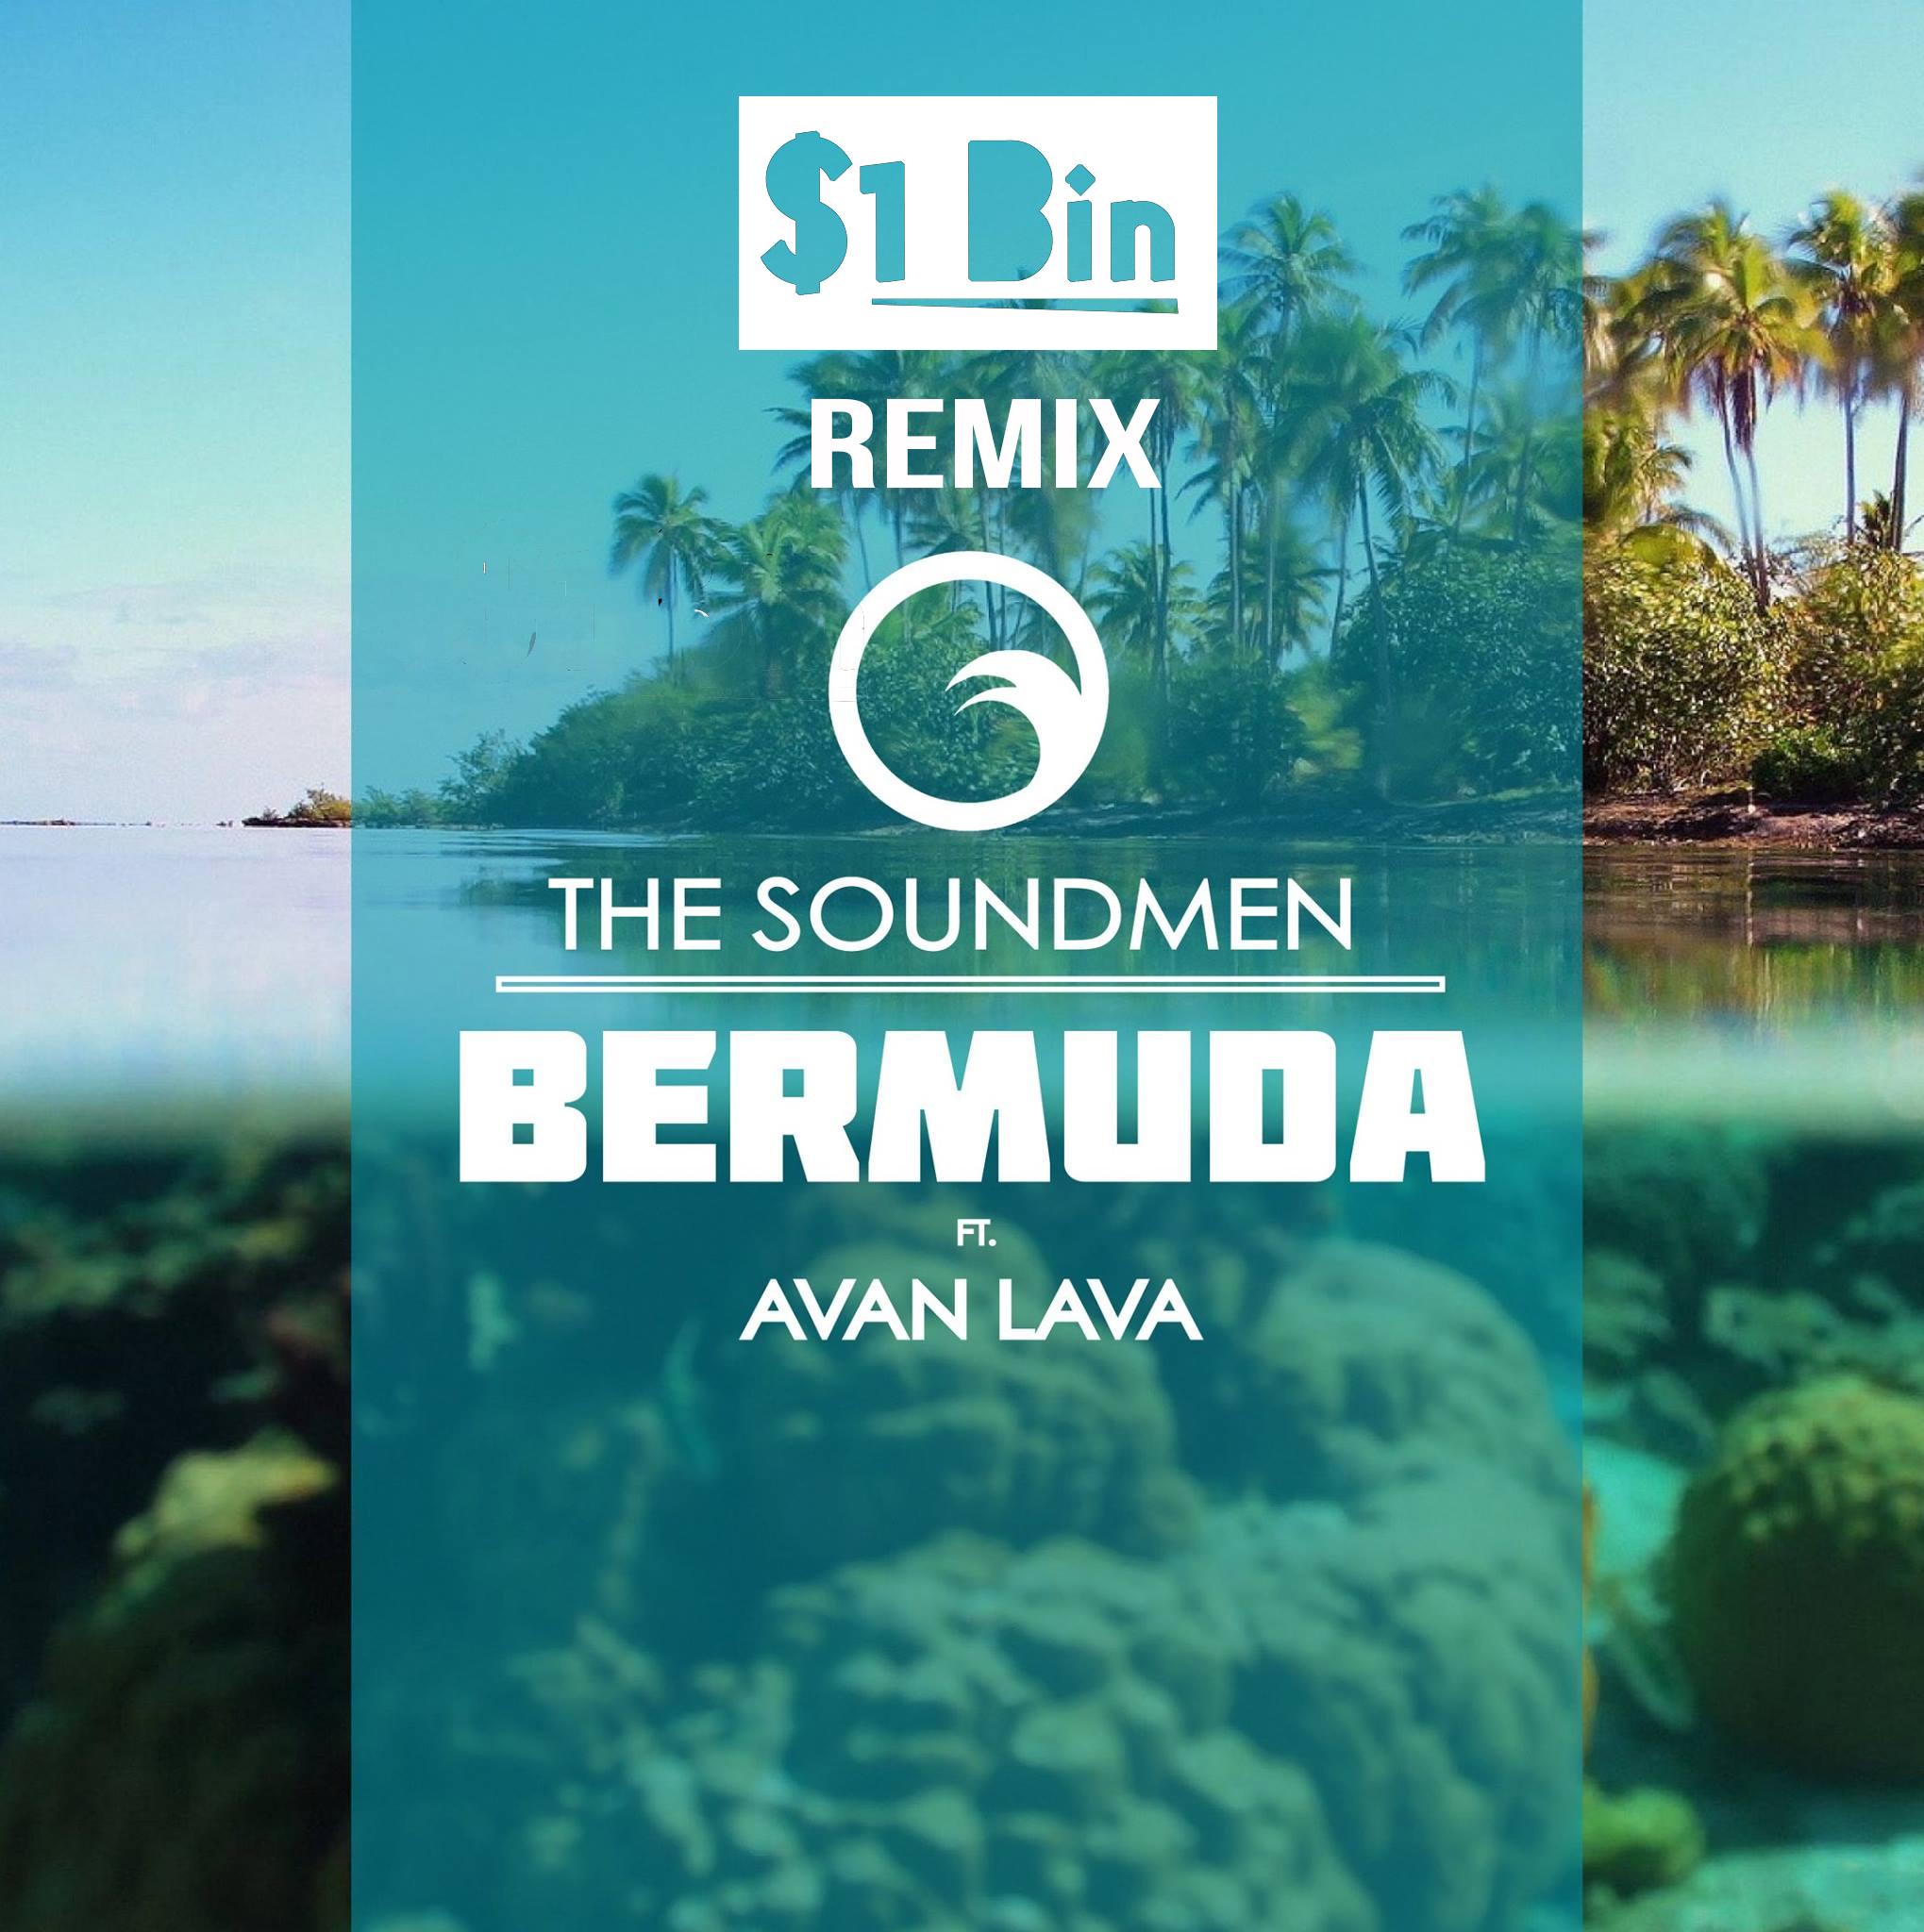 Bermuda | Dollar Bin Remix